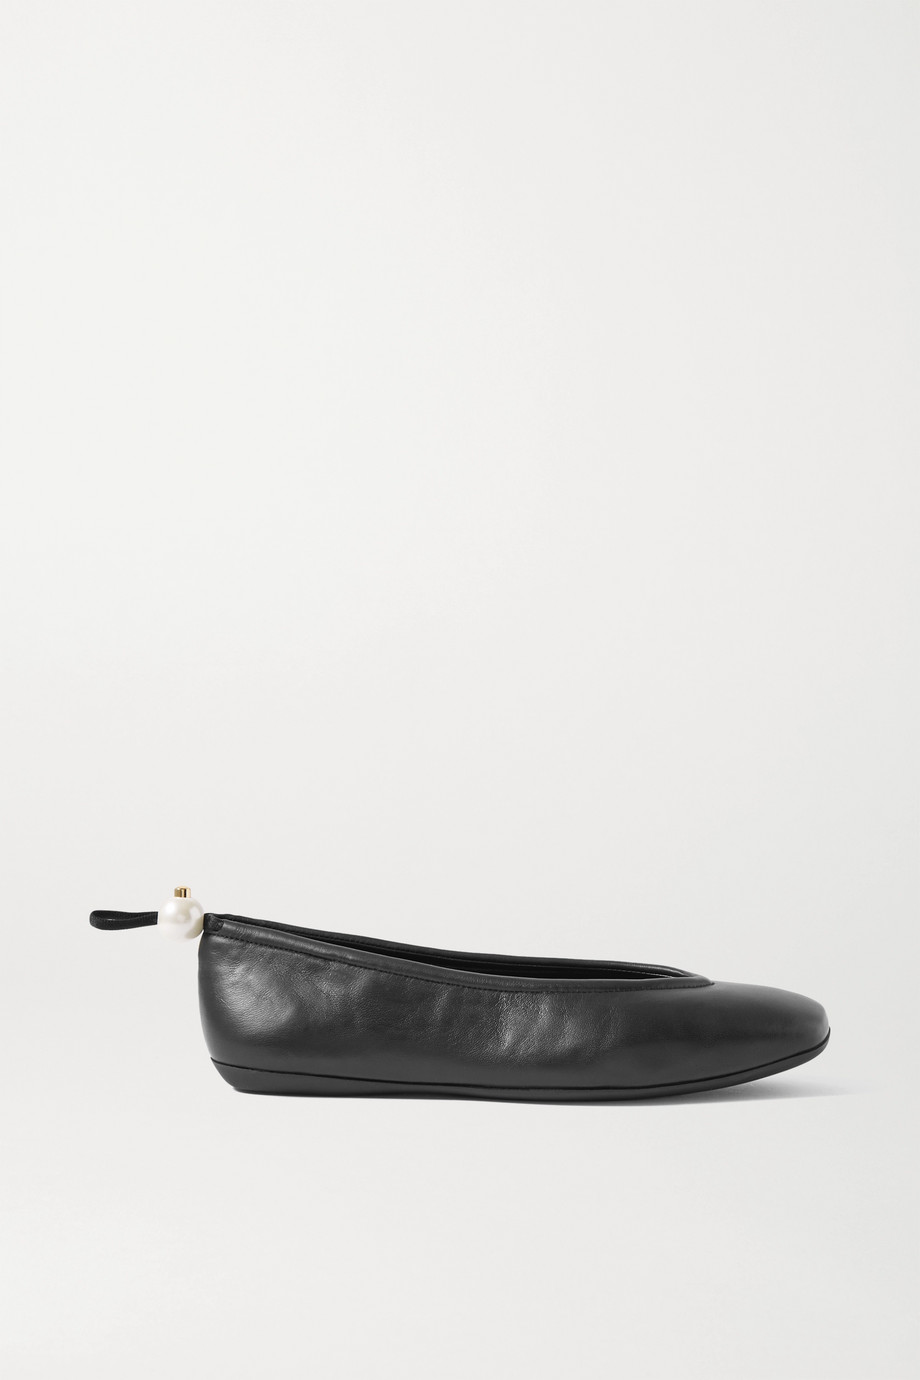 Nicholas Kirkwood Delfi 人造珍珠缀饰皮革芭蕾平底鞋